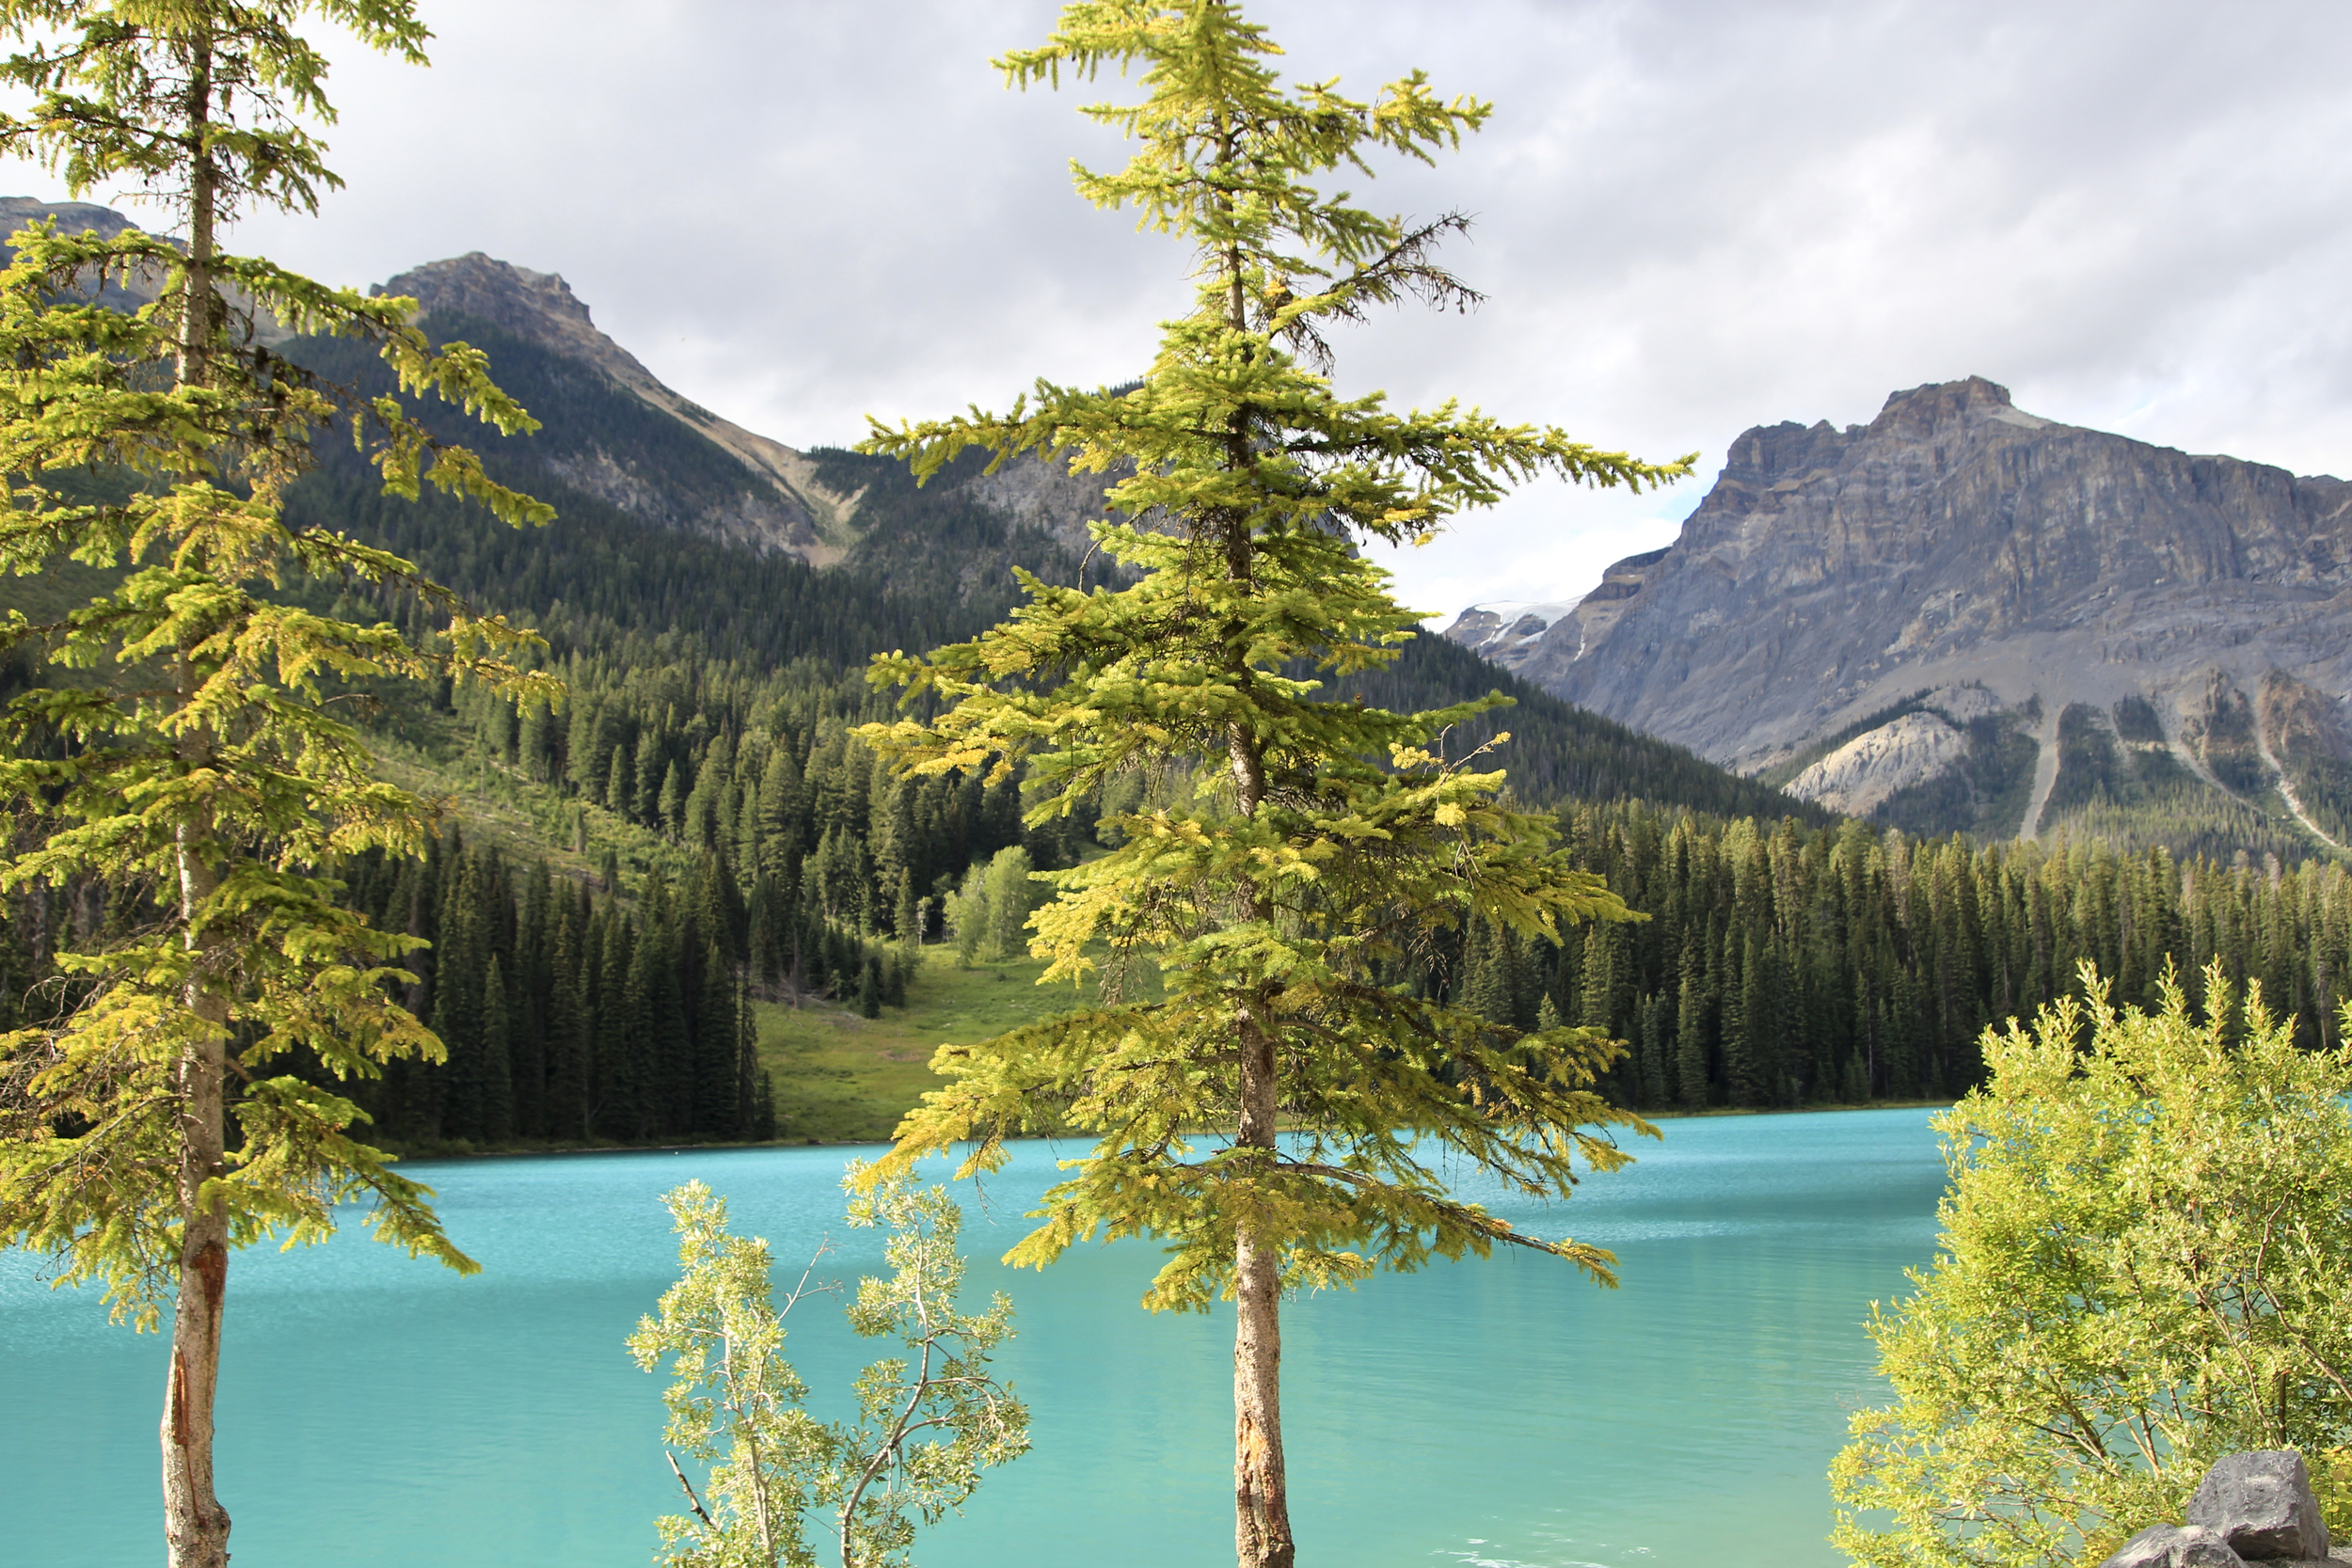 Emerald Lake.No filter. Seriously.